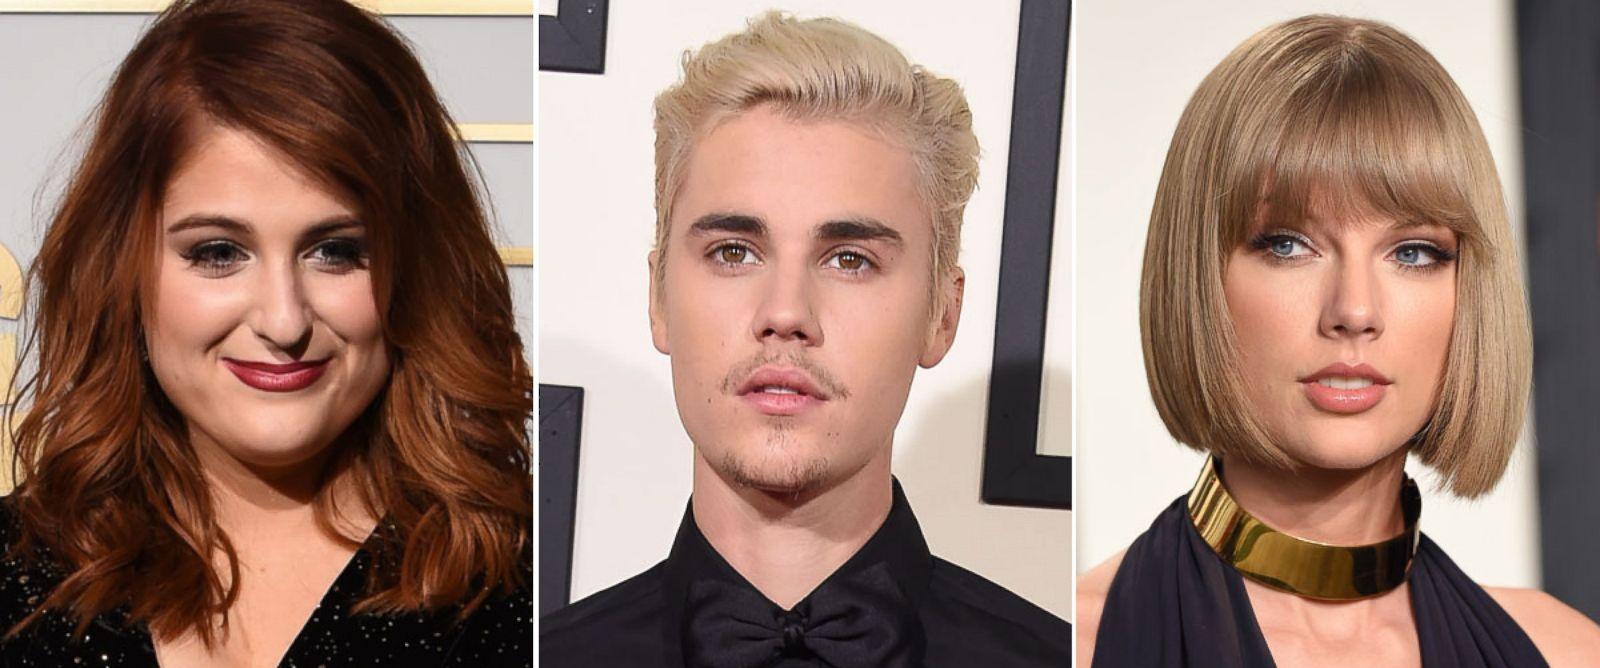 PHOTO: Meghan Trainor, Justin Bieber and Taylor Swift.